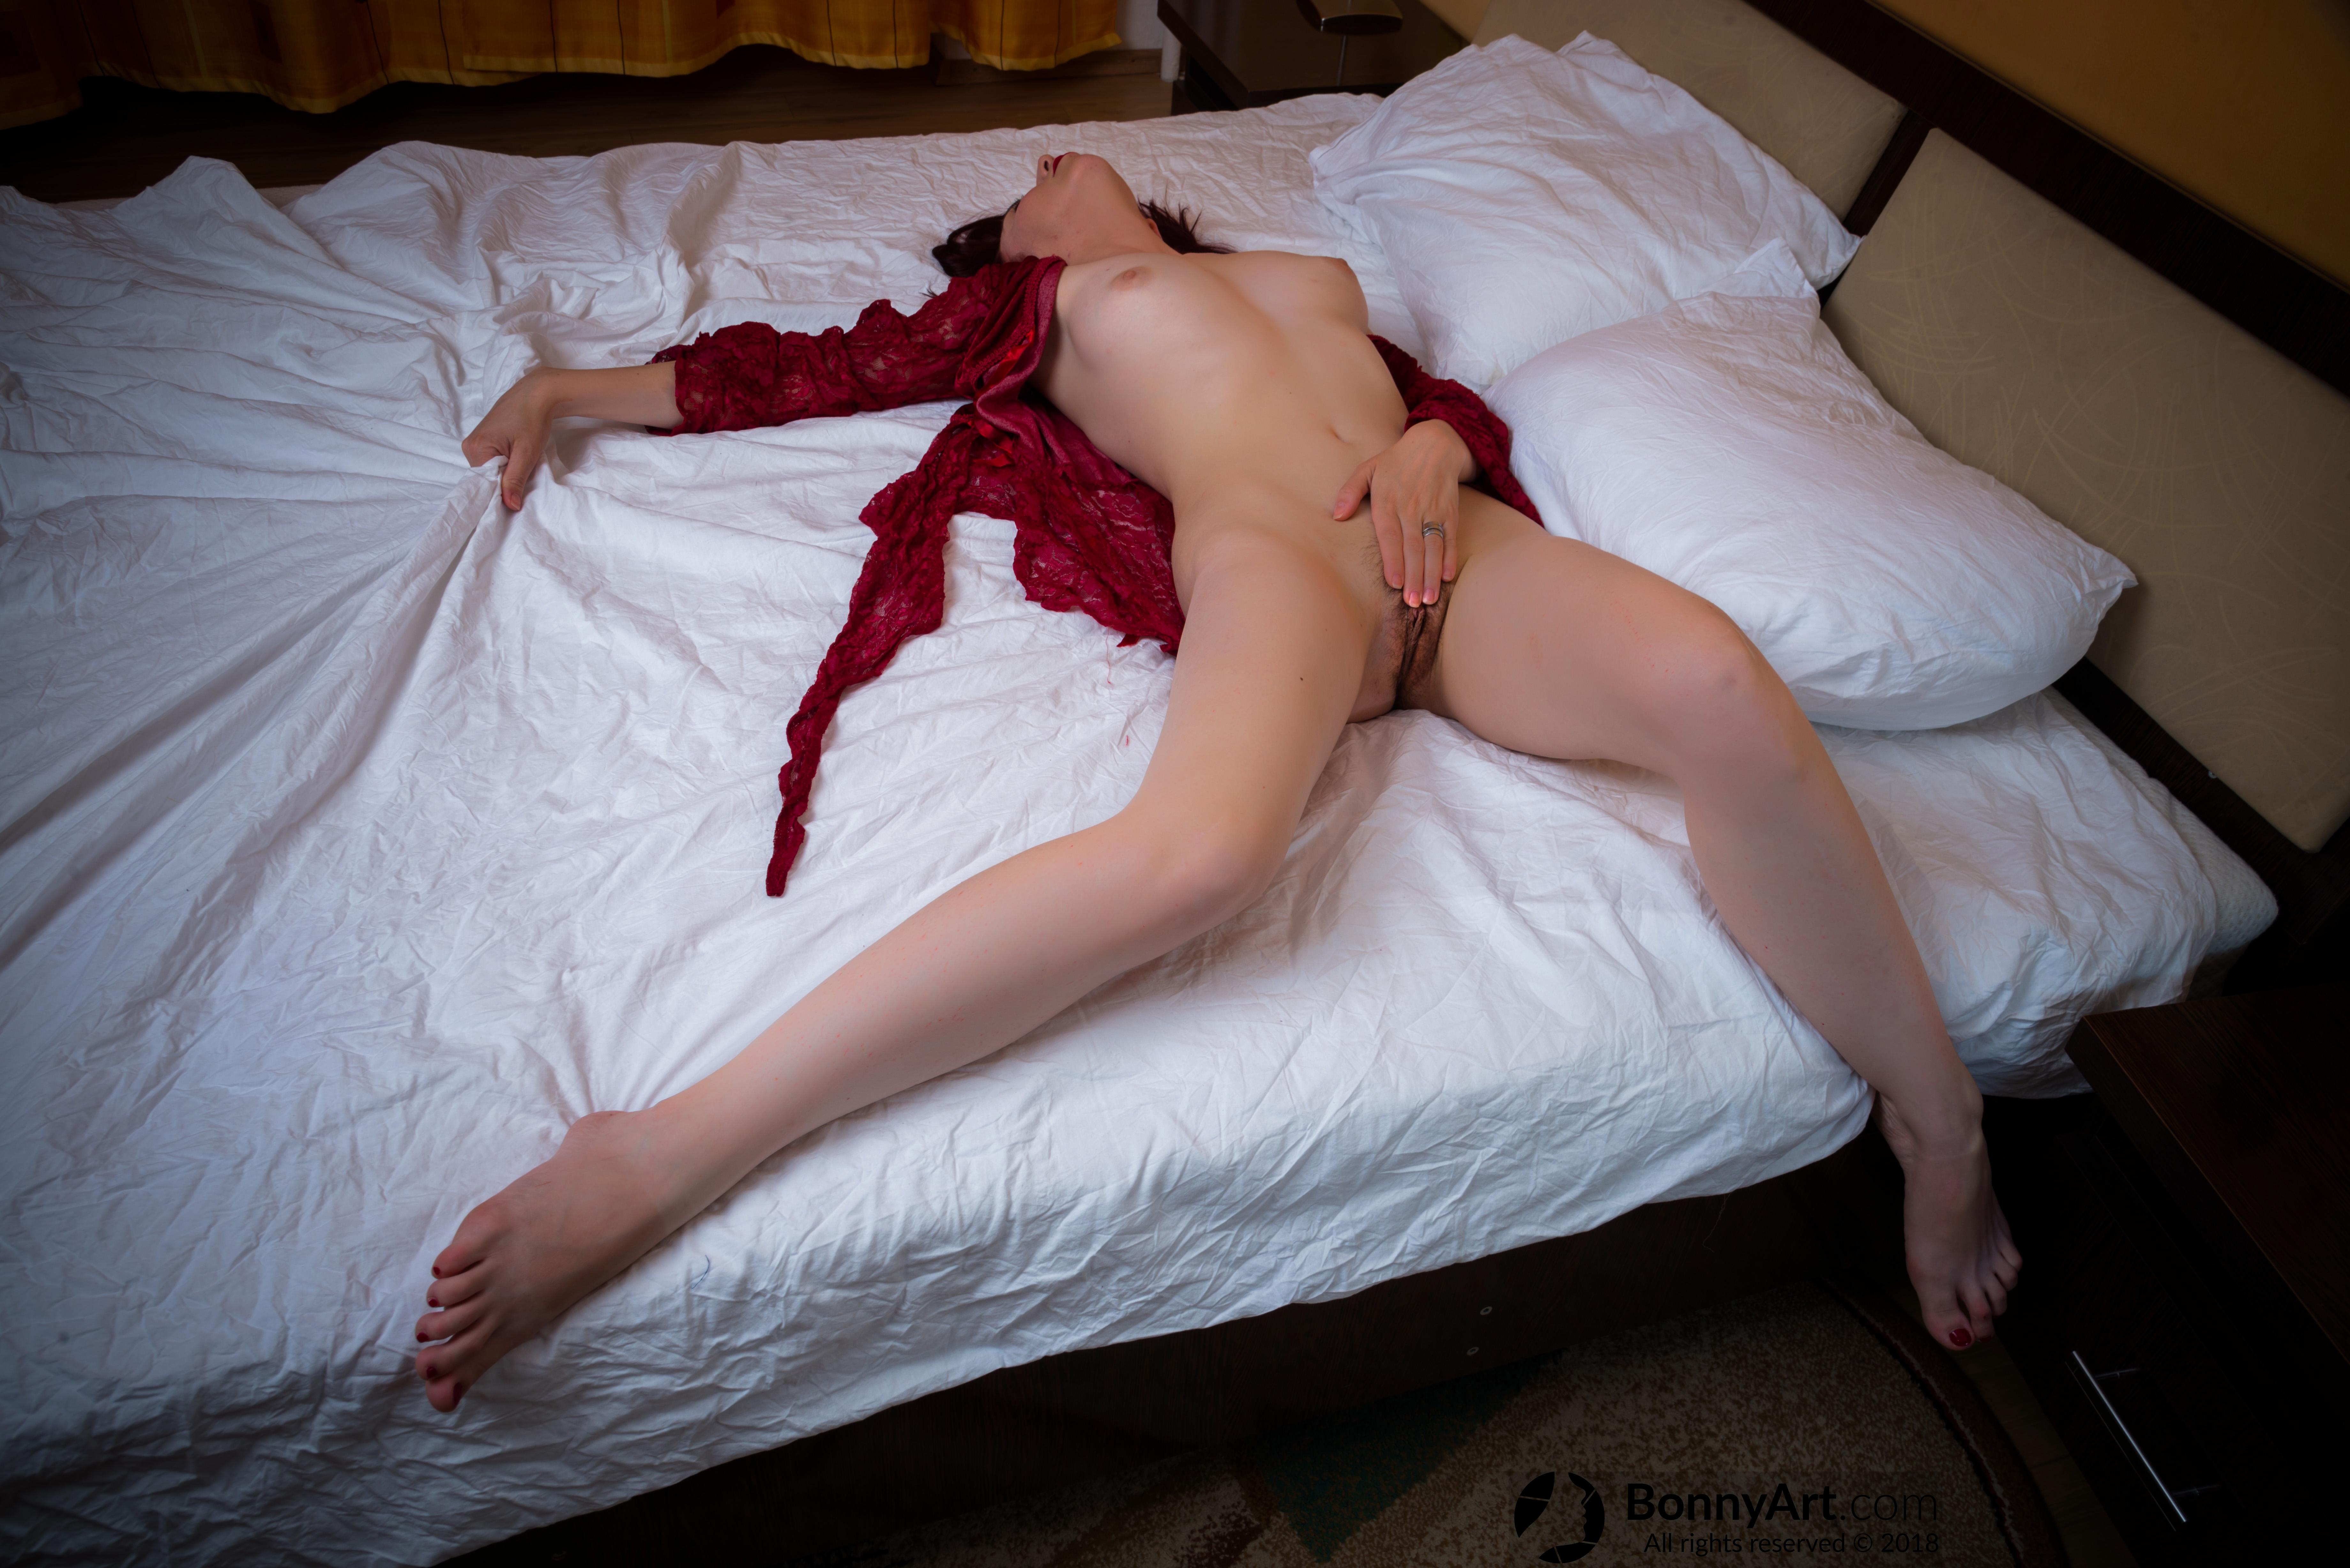 Woman's Private Climax Masturbation in Bed HD